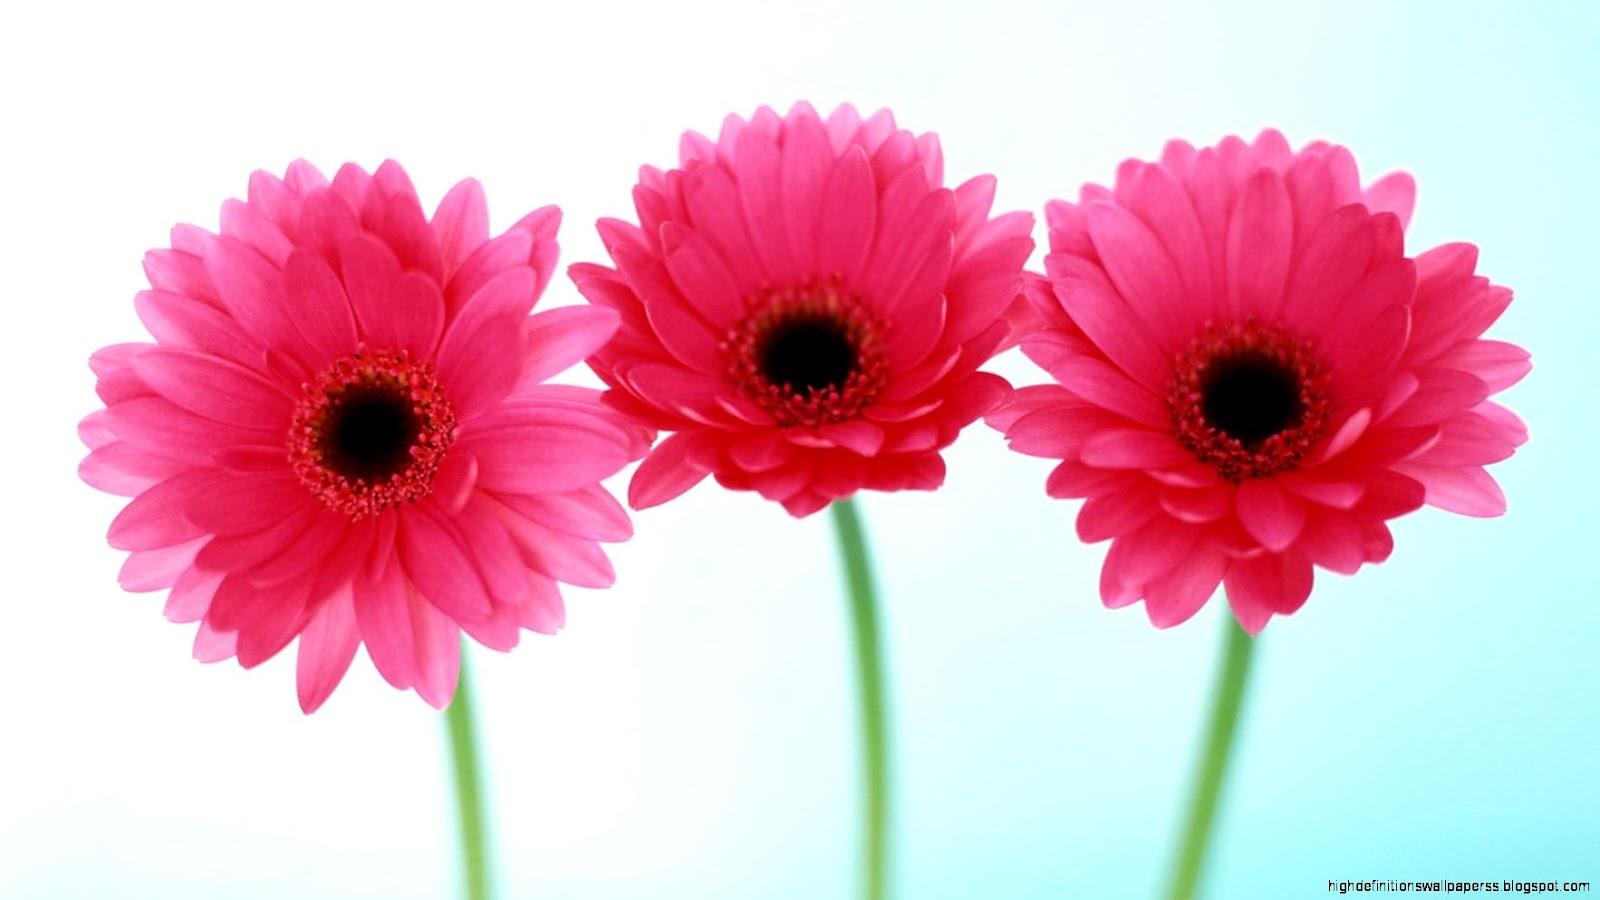 Pink Flower Round Hd Flower Wallpaper High Definitions Wallpapers